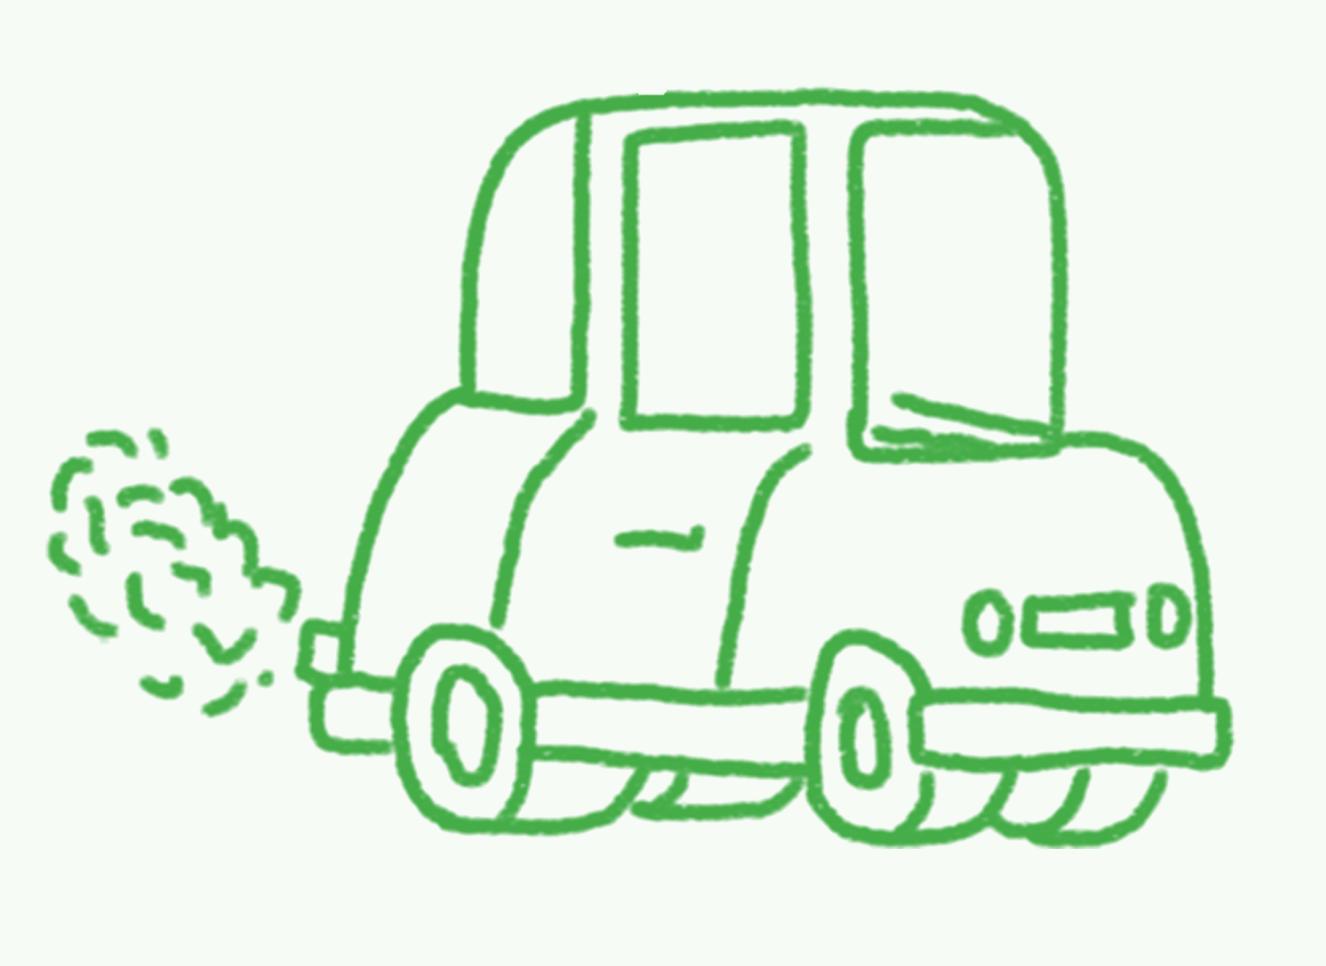 Clipart car air pollution. Facts claircity eu is